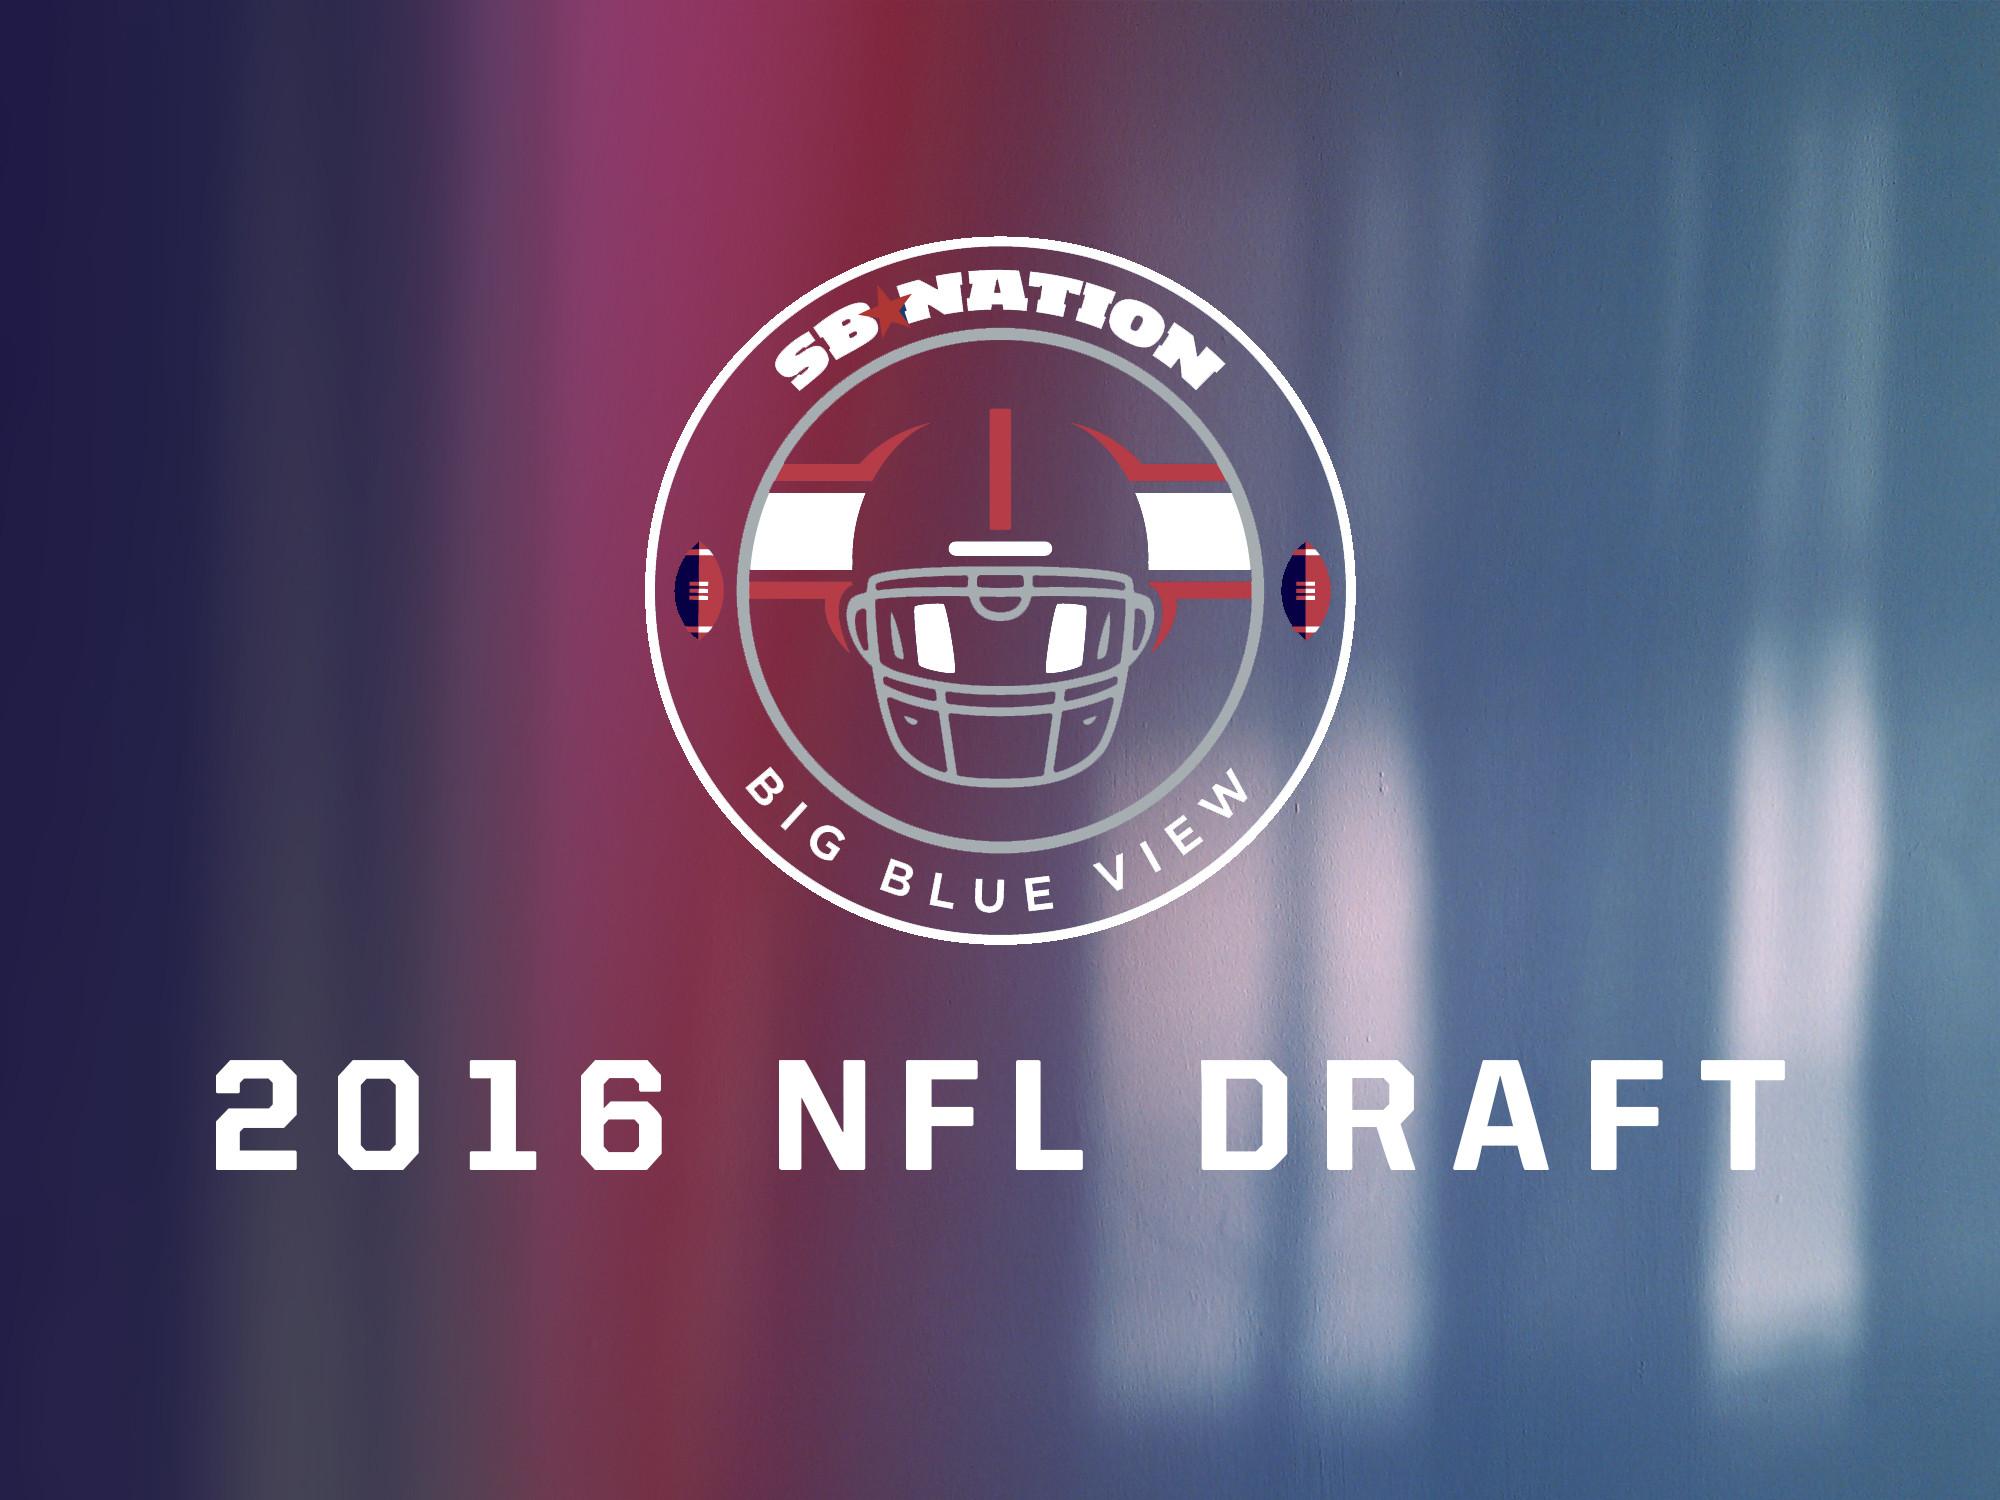 2016 nfl draft logo